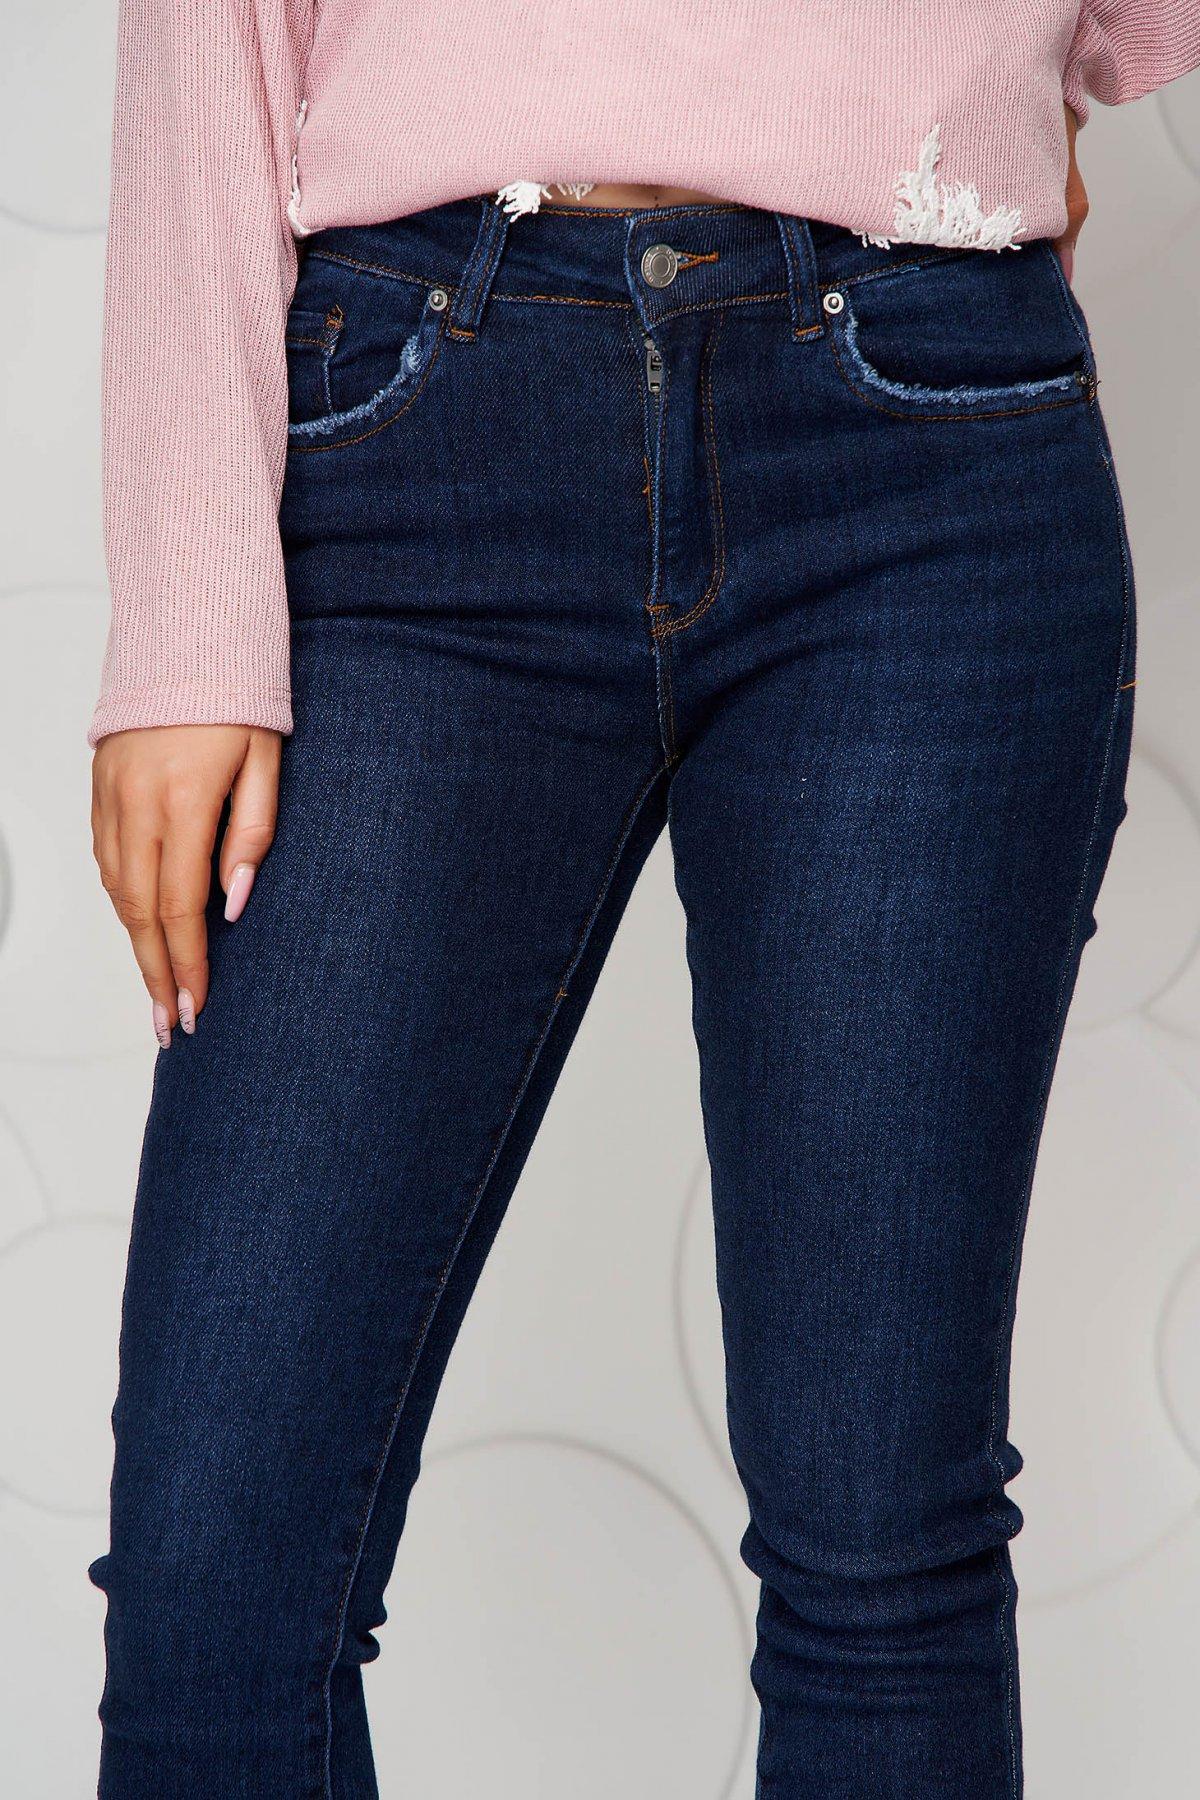 Blugi albastri SunShine skinny cu talie inalta pantalonii sunt elastici